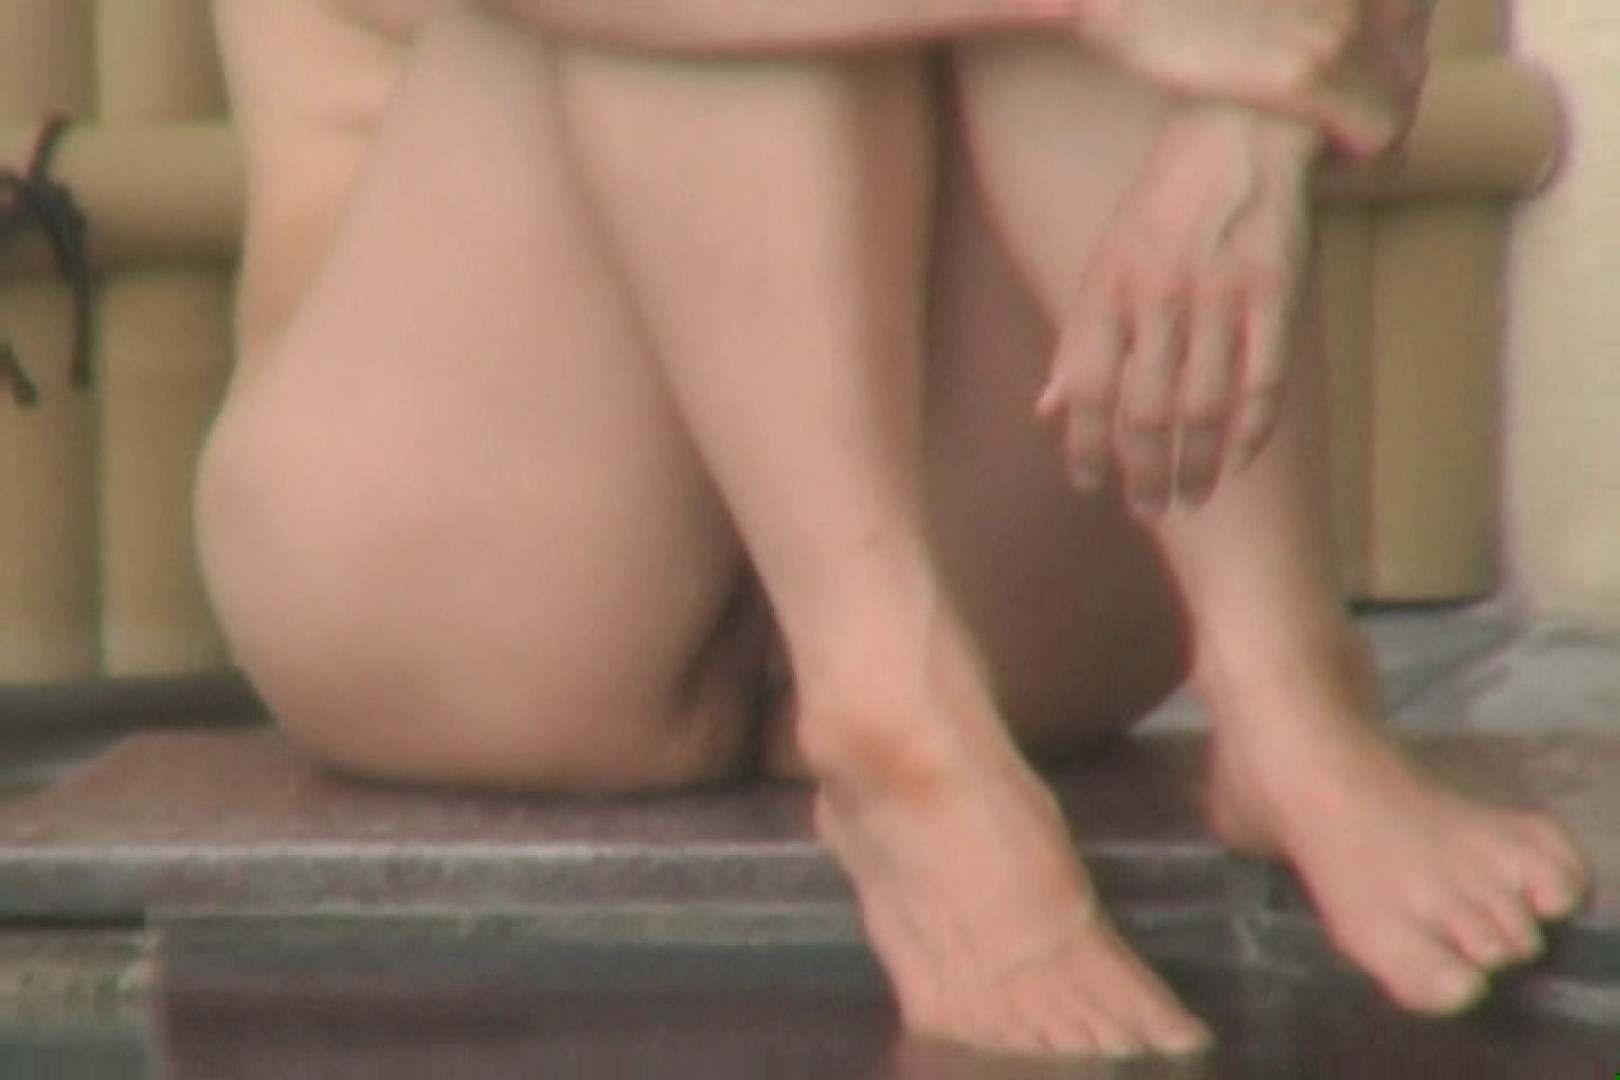 Aquaな露天風呂Vol.578 露天風呂突入 のぞき動画画像 70pic 11